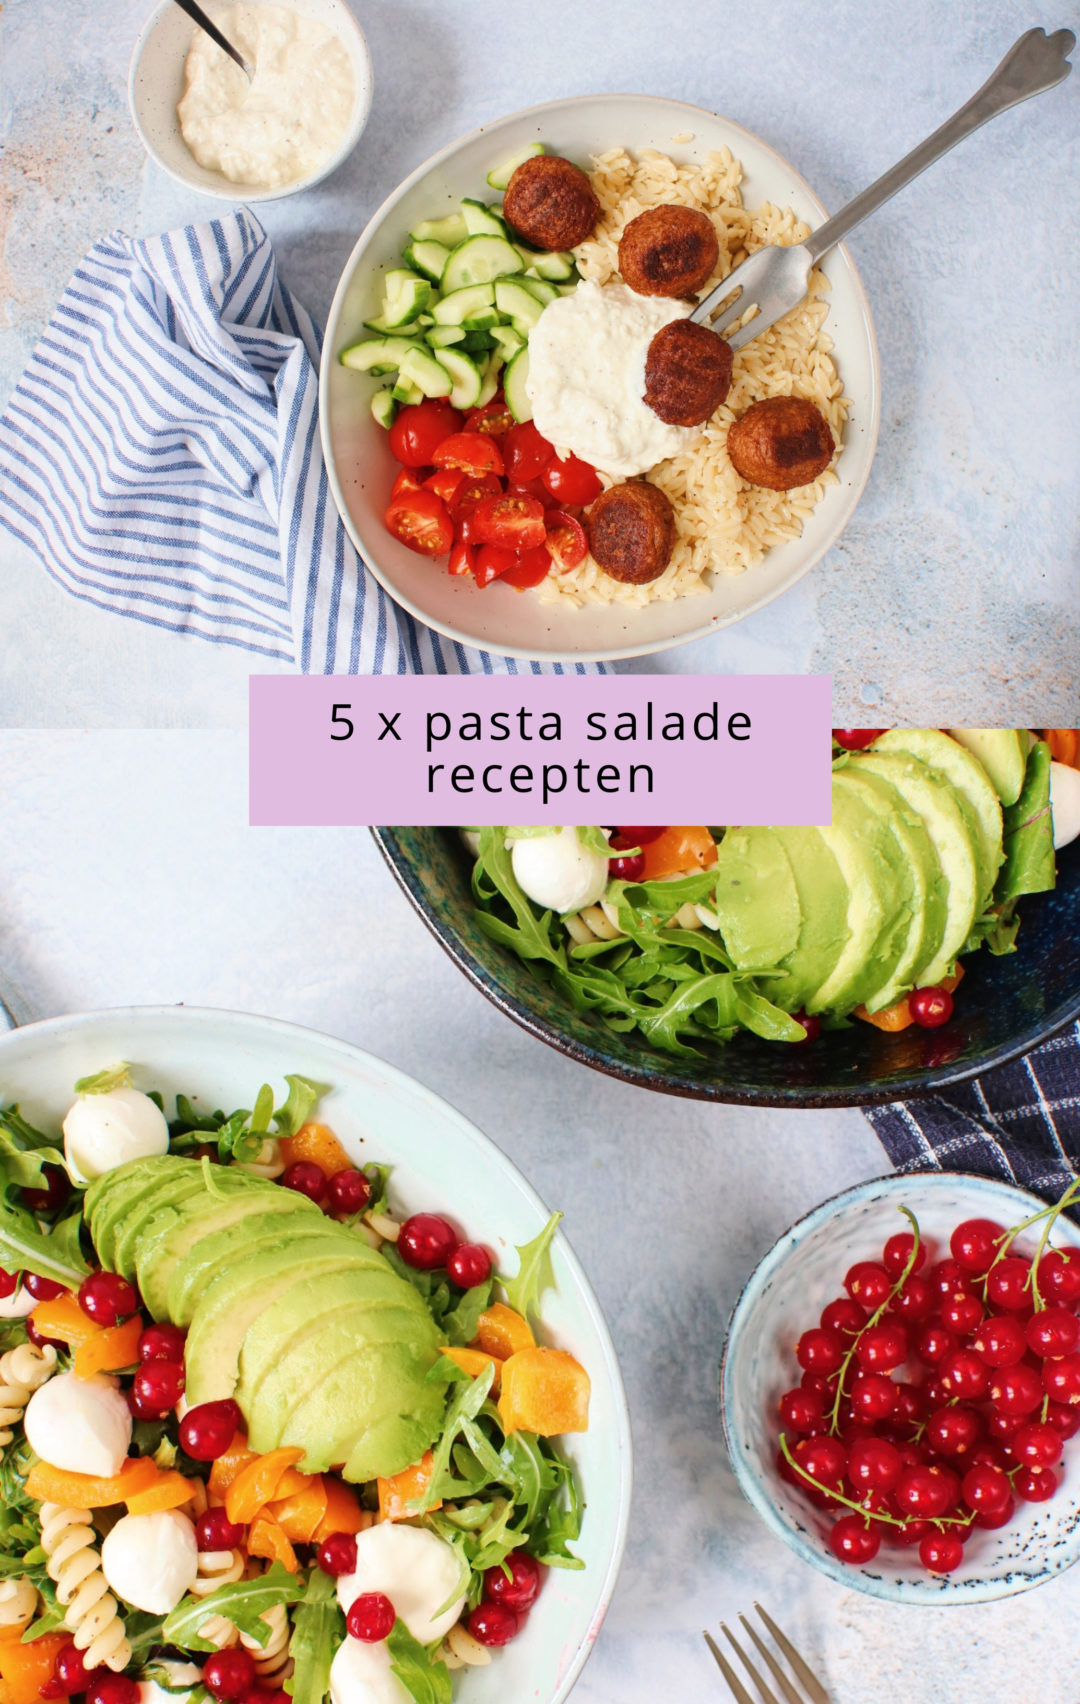 5x pasta salades www.jaimyskitchen.nl